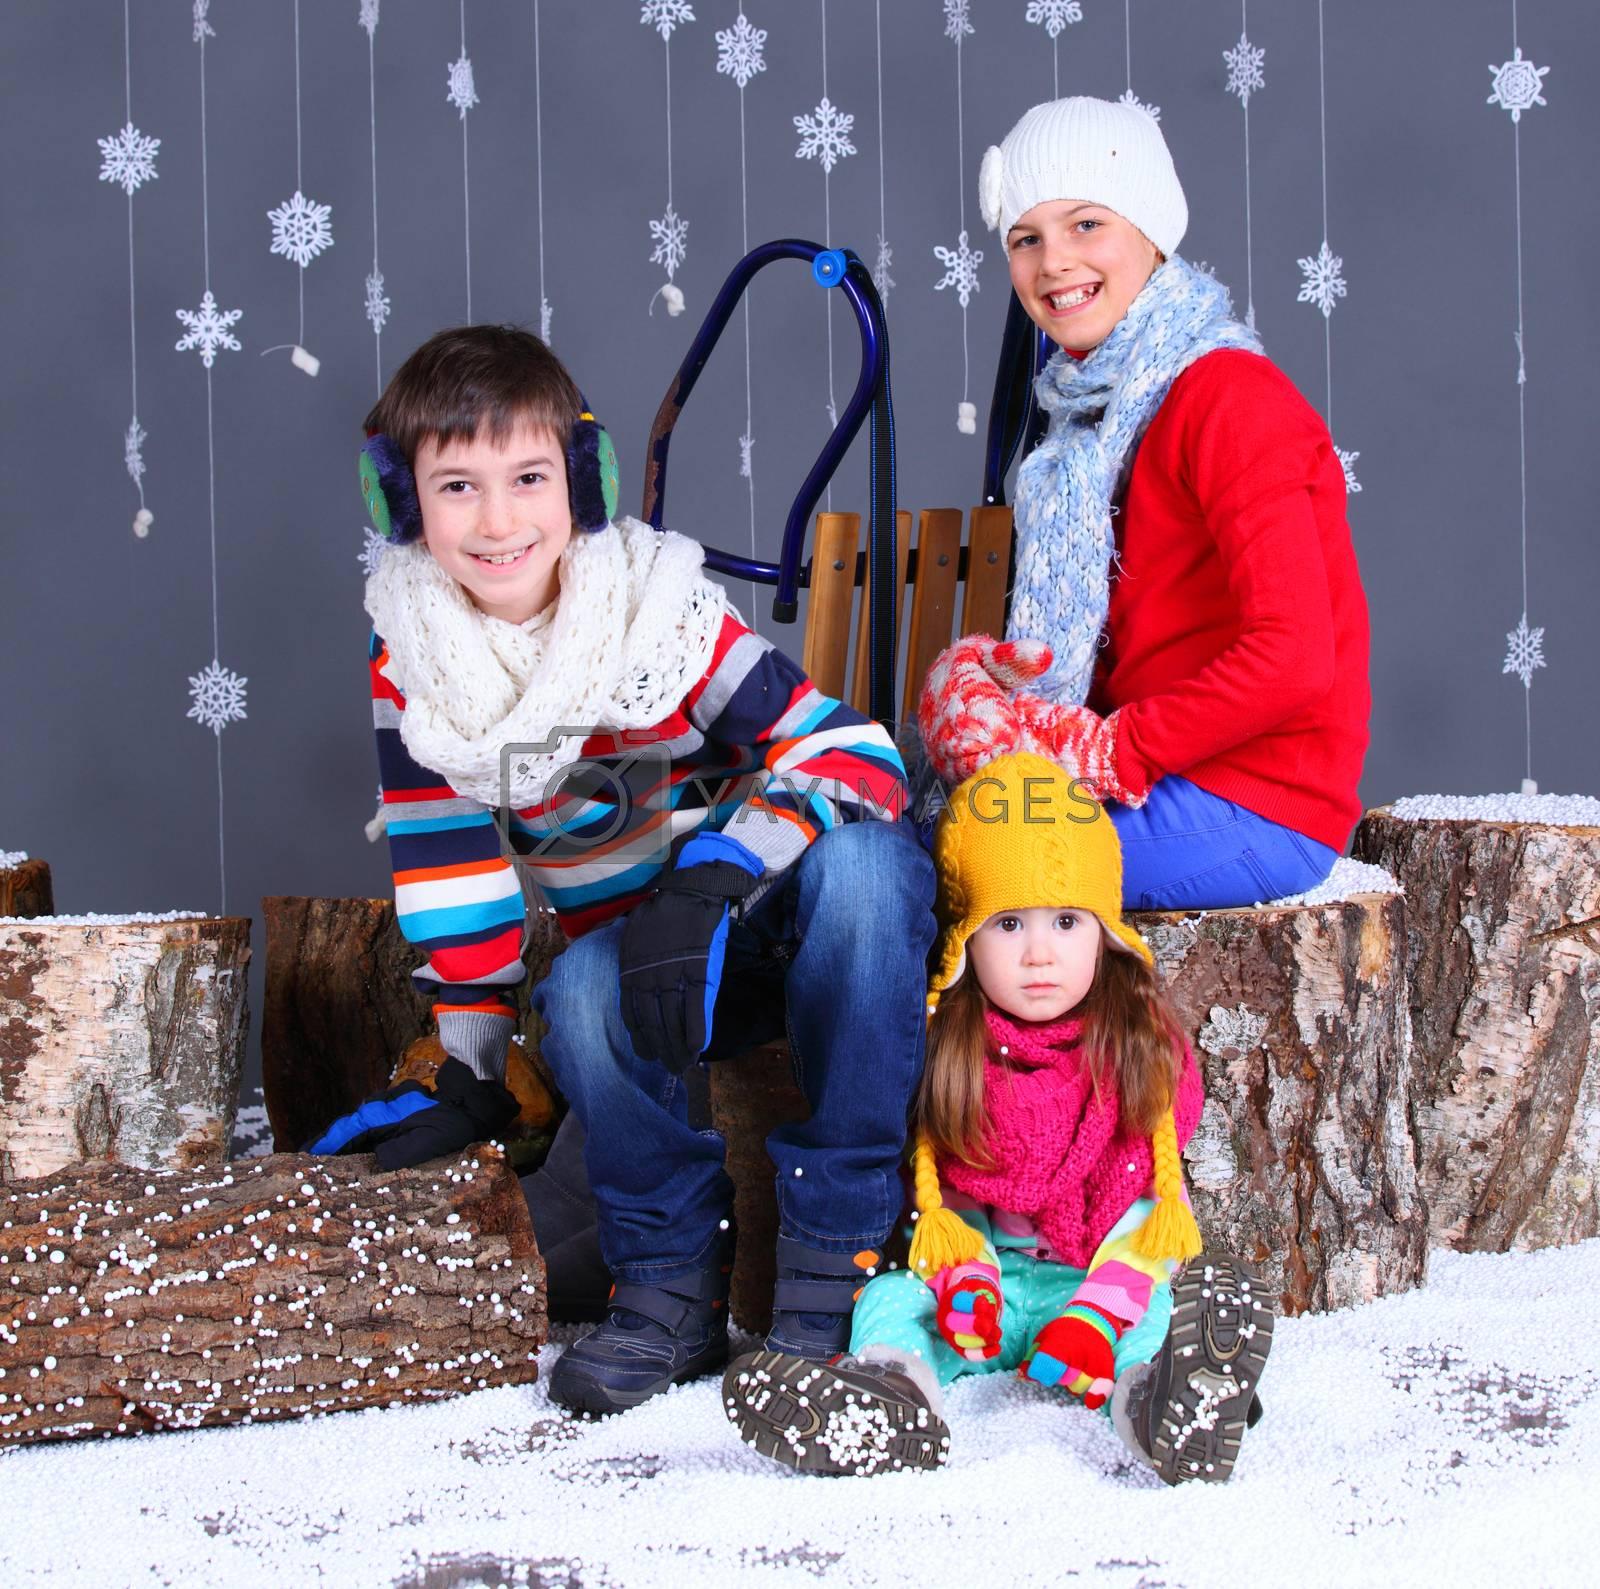 Winter Fashion. Adorable happy boy and girls. by maxoliki